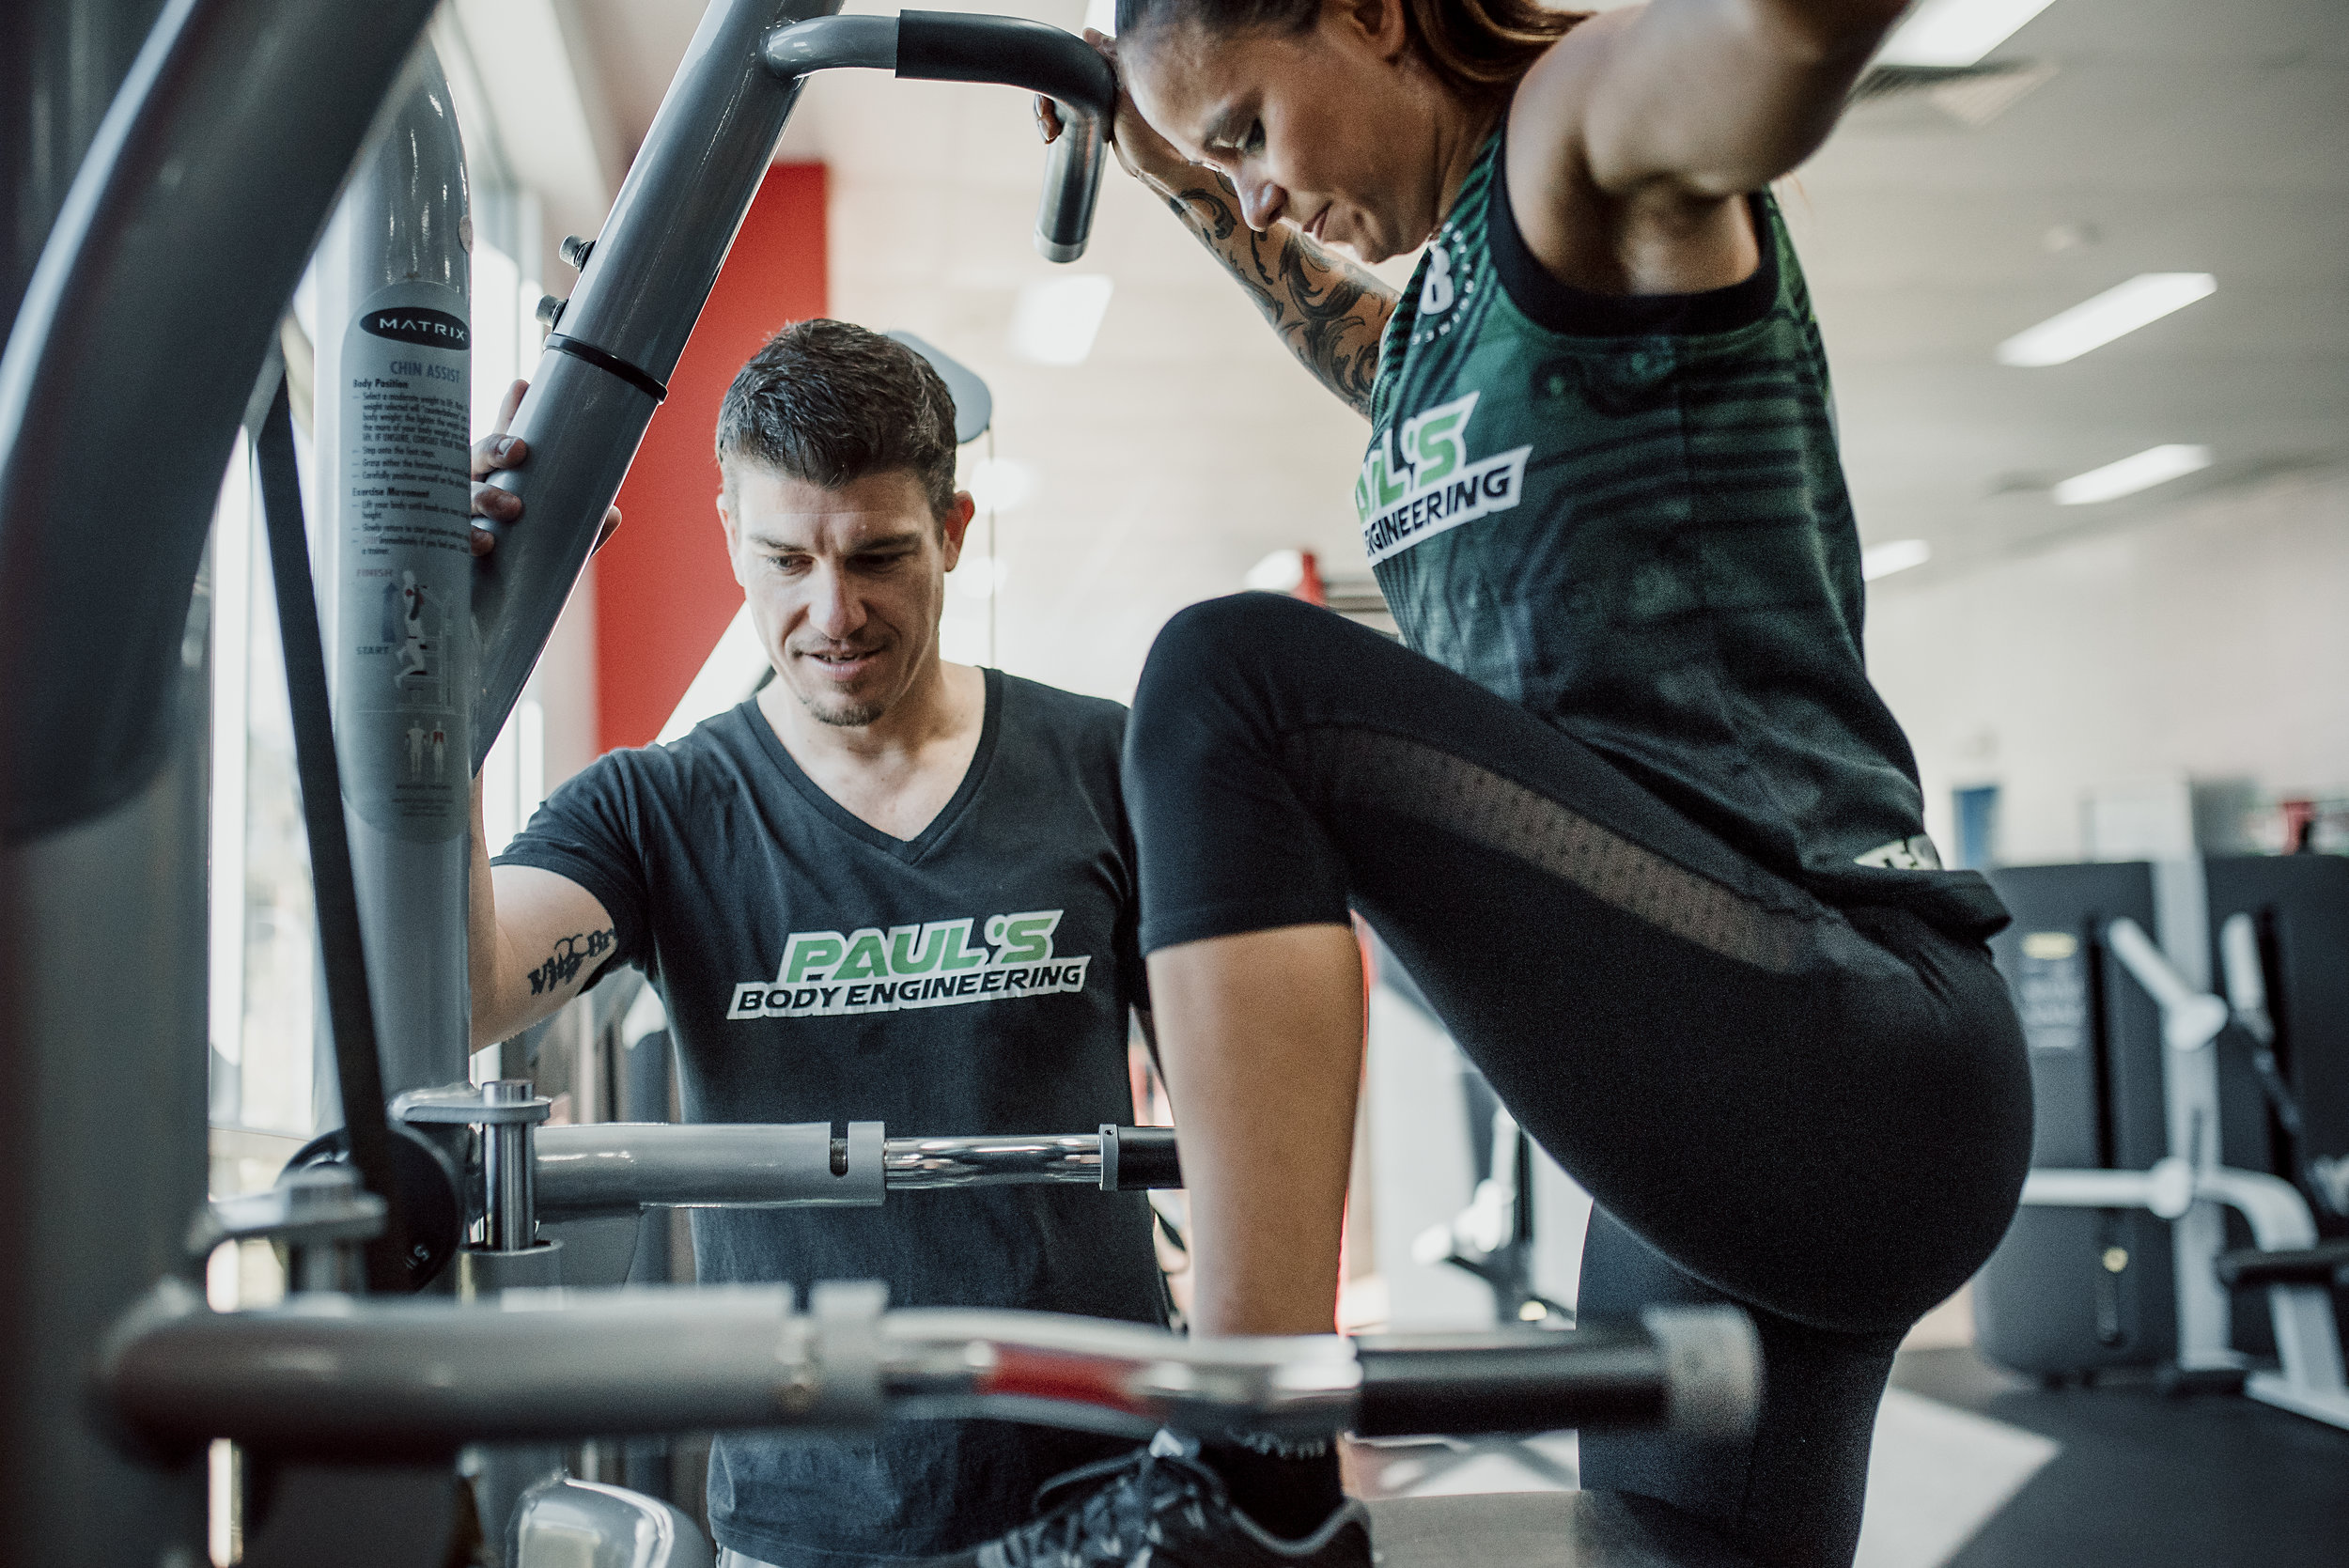 personal trainer sunshine coast weight training nutritional coaching